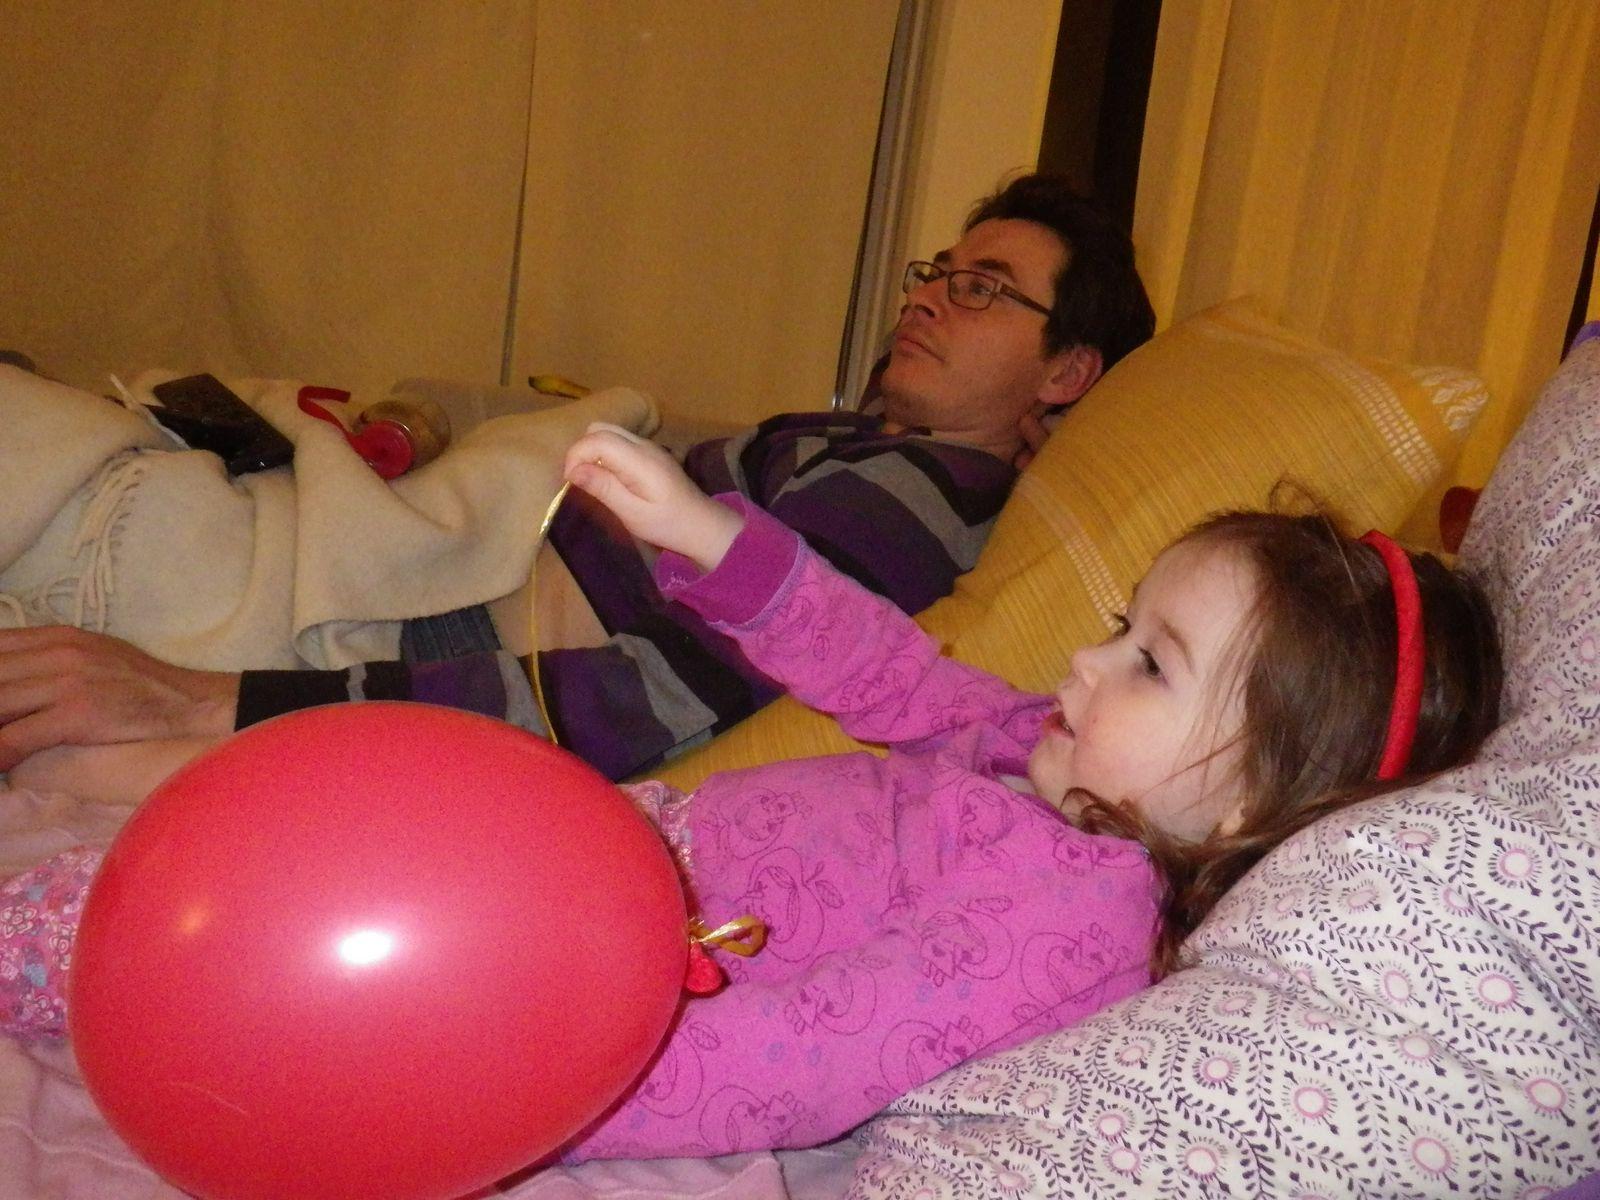 2013-02-11-2354_-_jesper-eugenius-labansen_ukaleq-eugenius-labansen